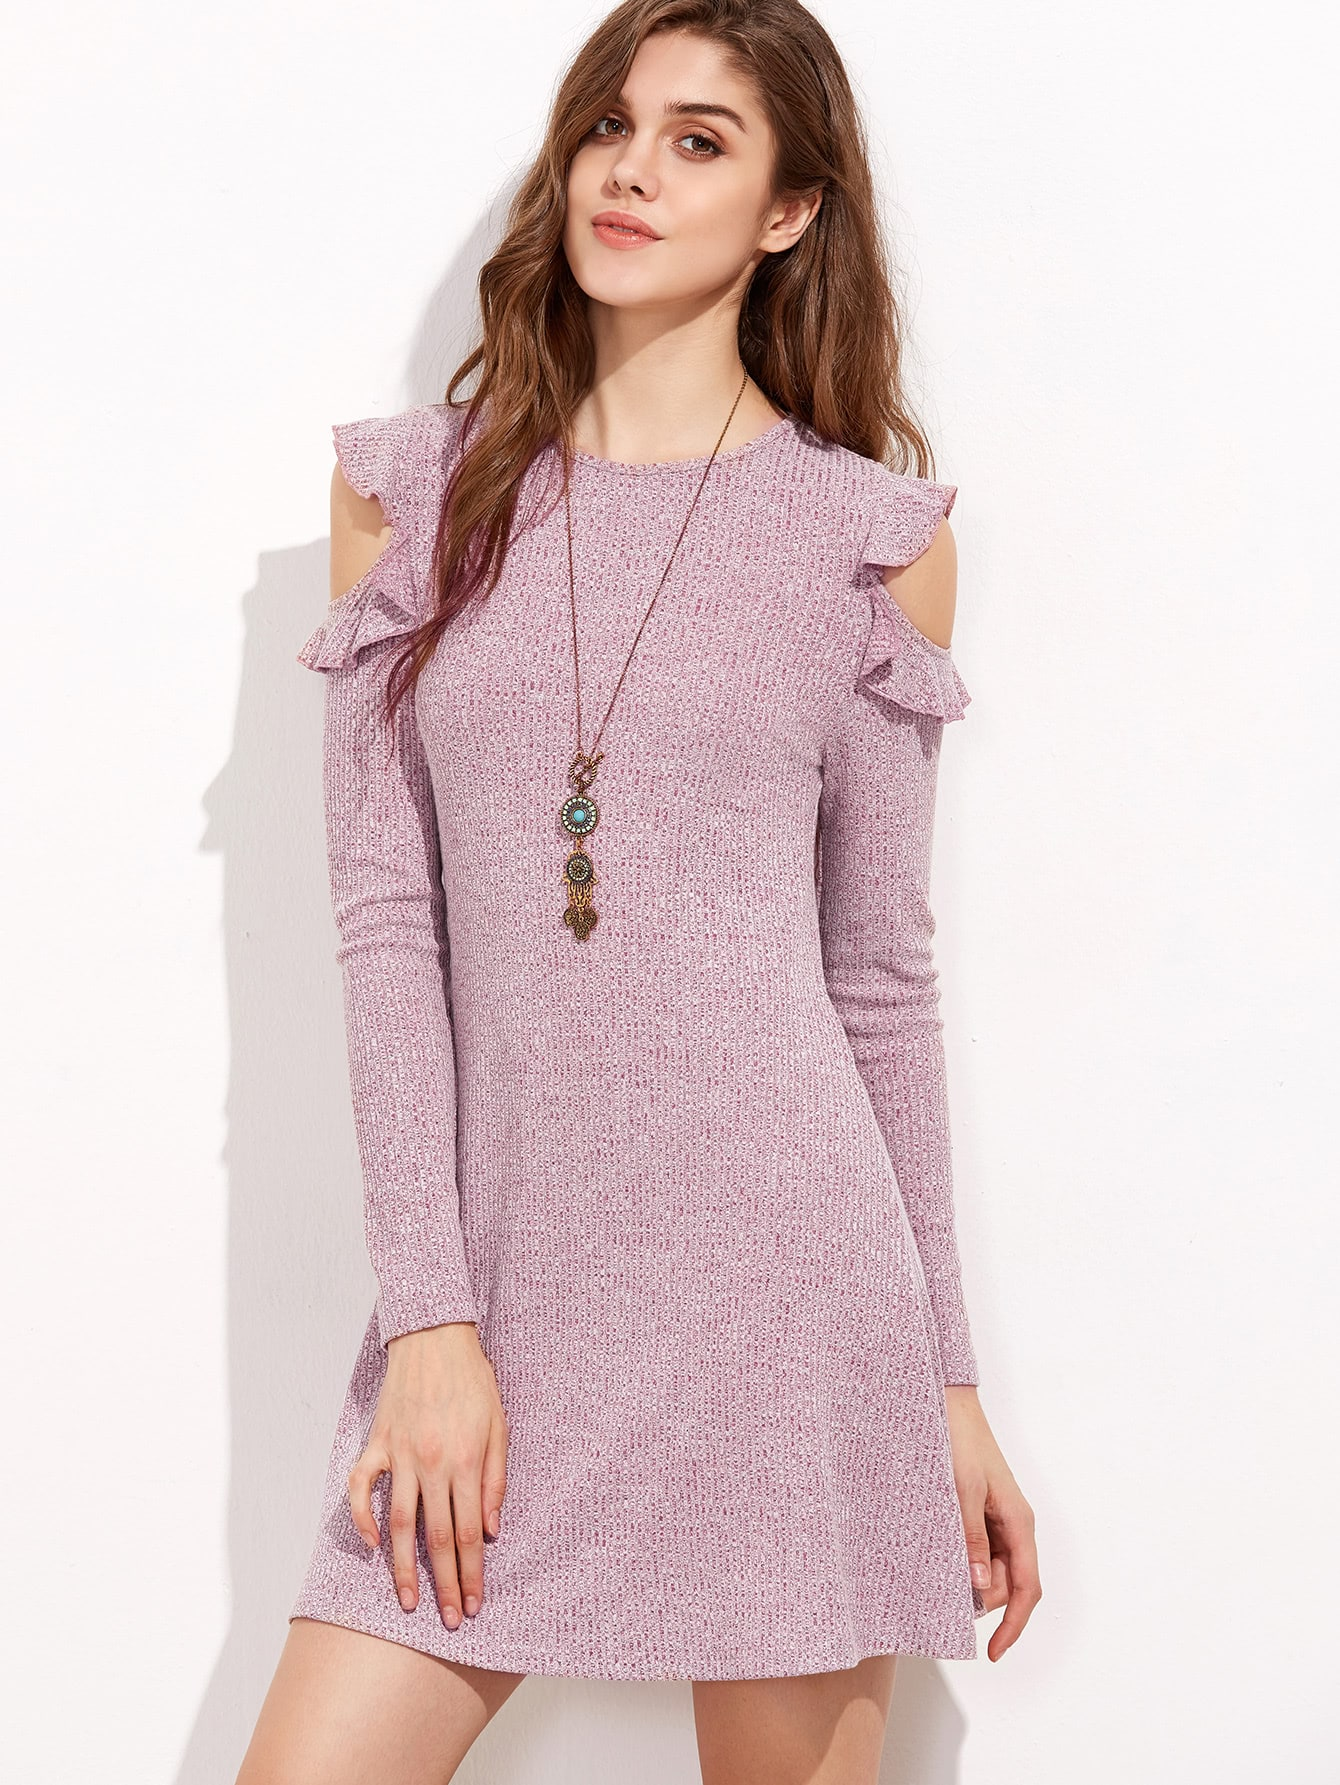 Burgundy Marled Ribbed Knit Ruffle Open Shoulder Dress dress161129705